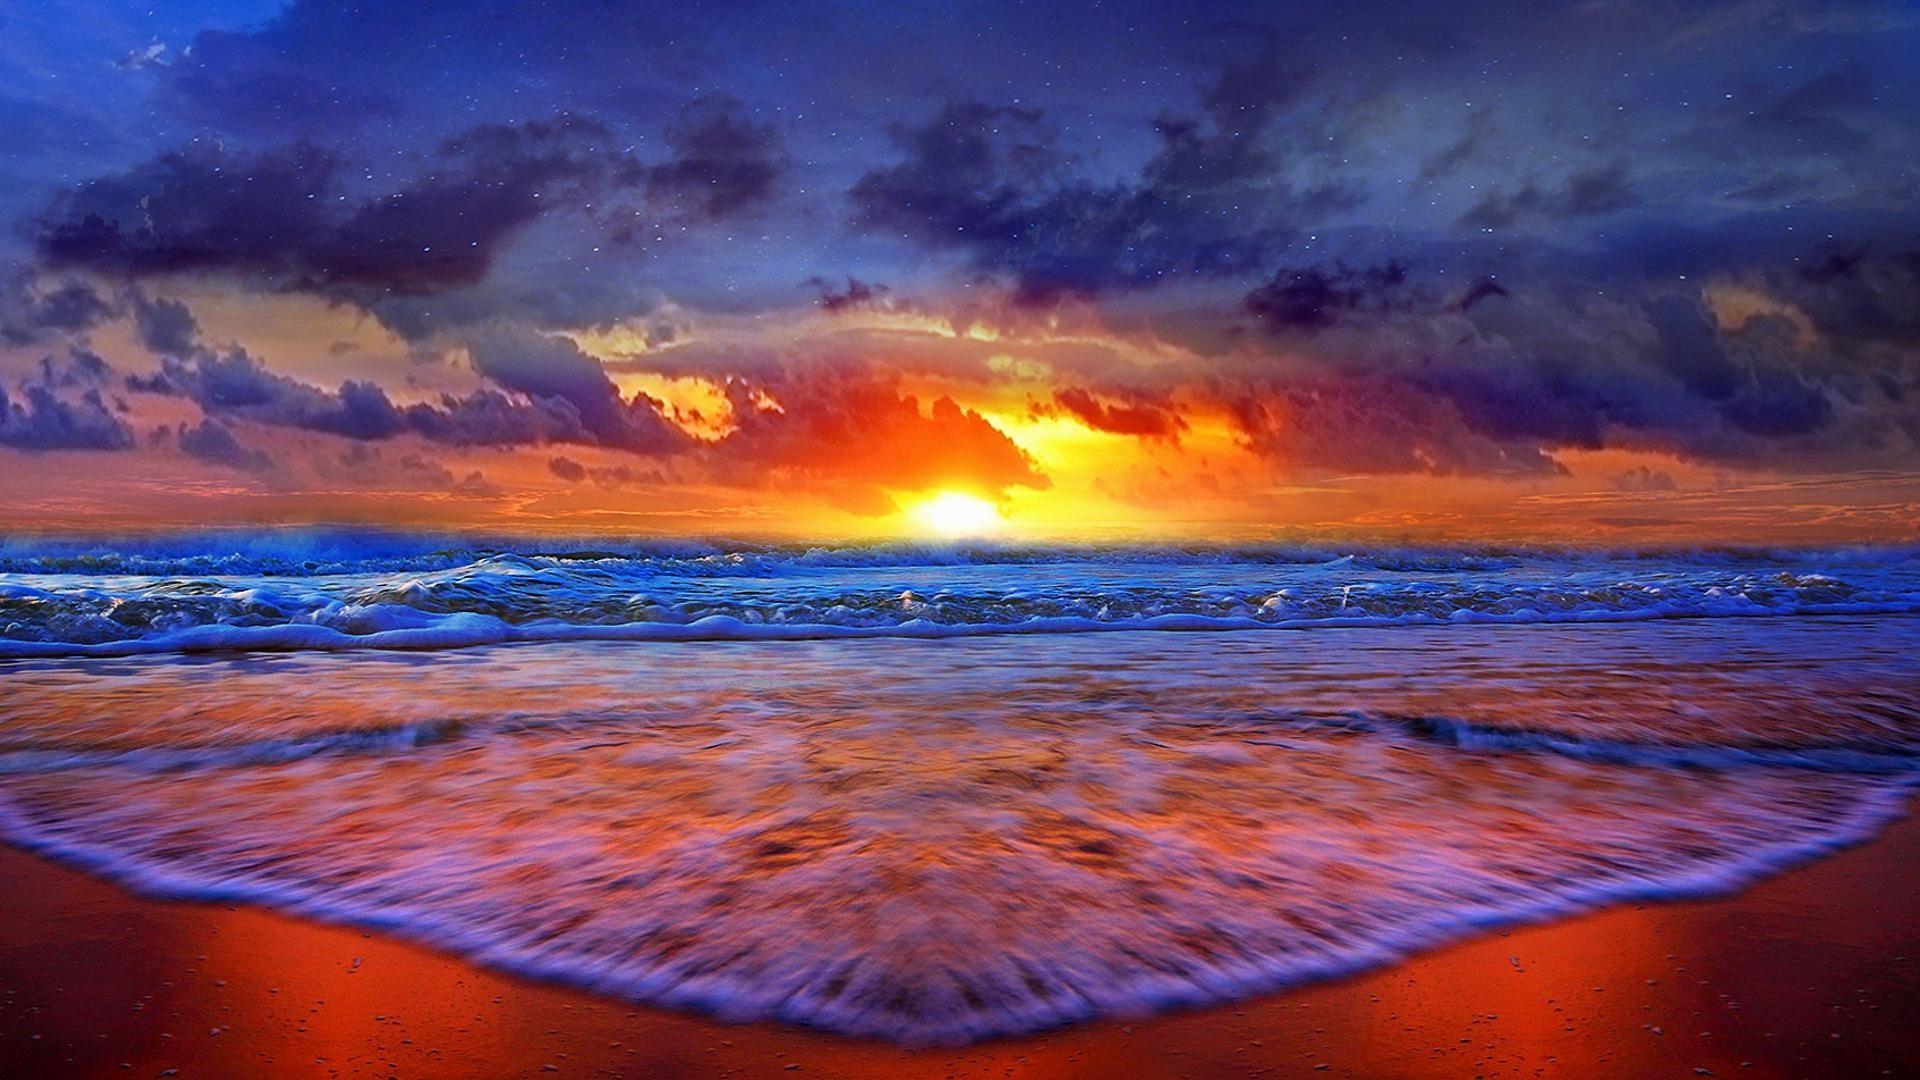 1920x1080 7 Beautiful Sunset Wallpaper HD7 600x338